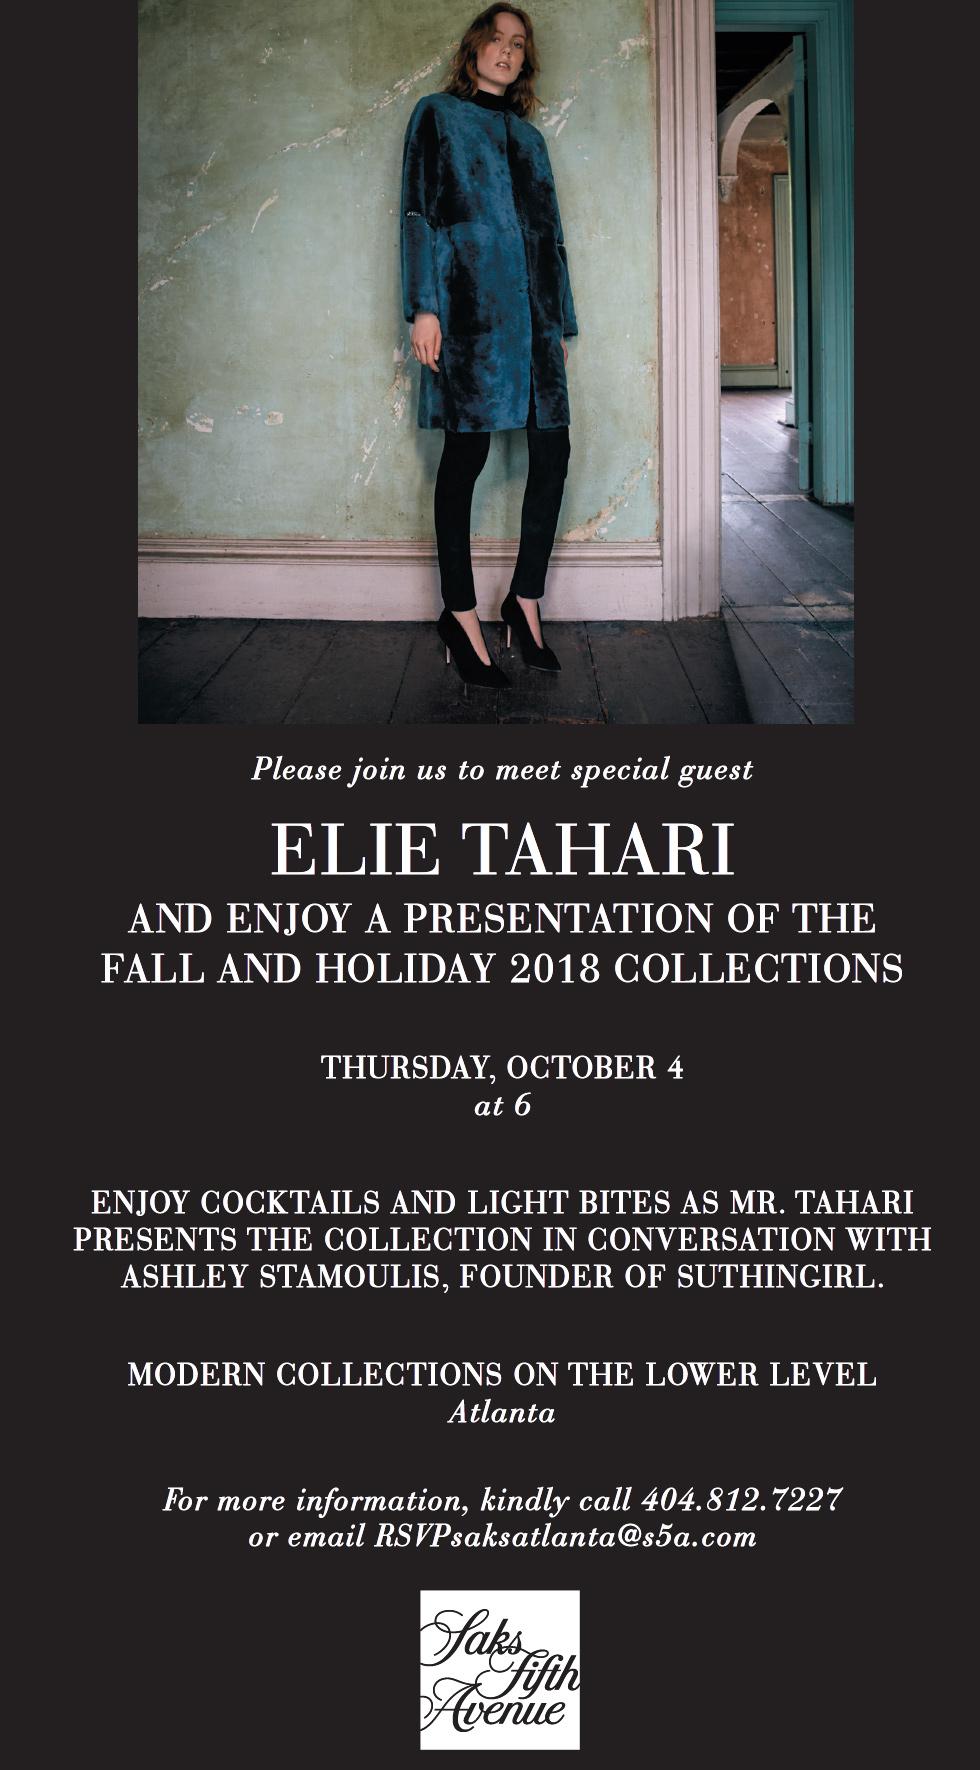 eli tahari fall and holiday 2018 collection